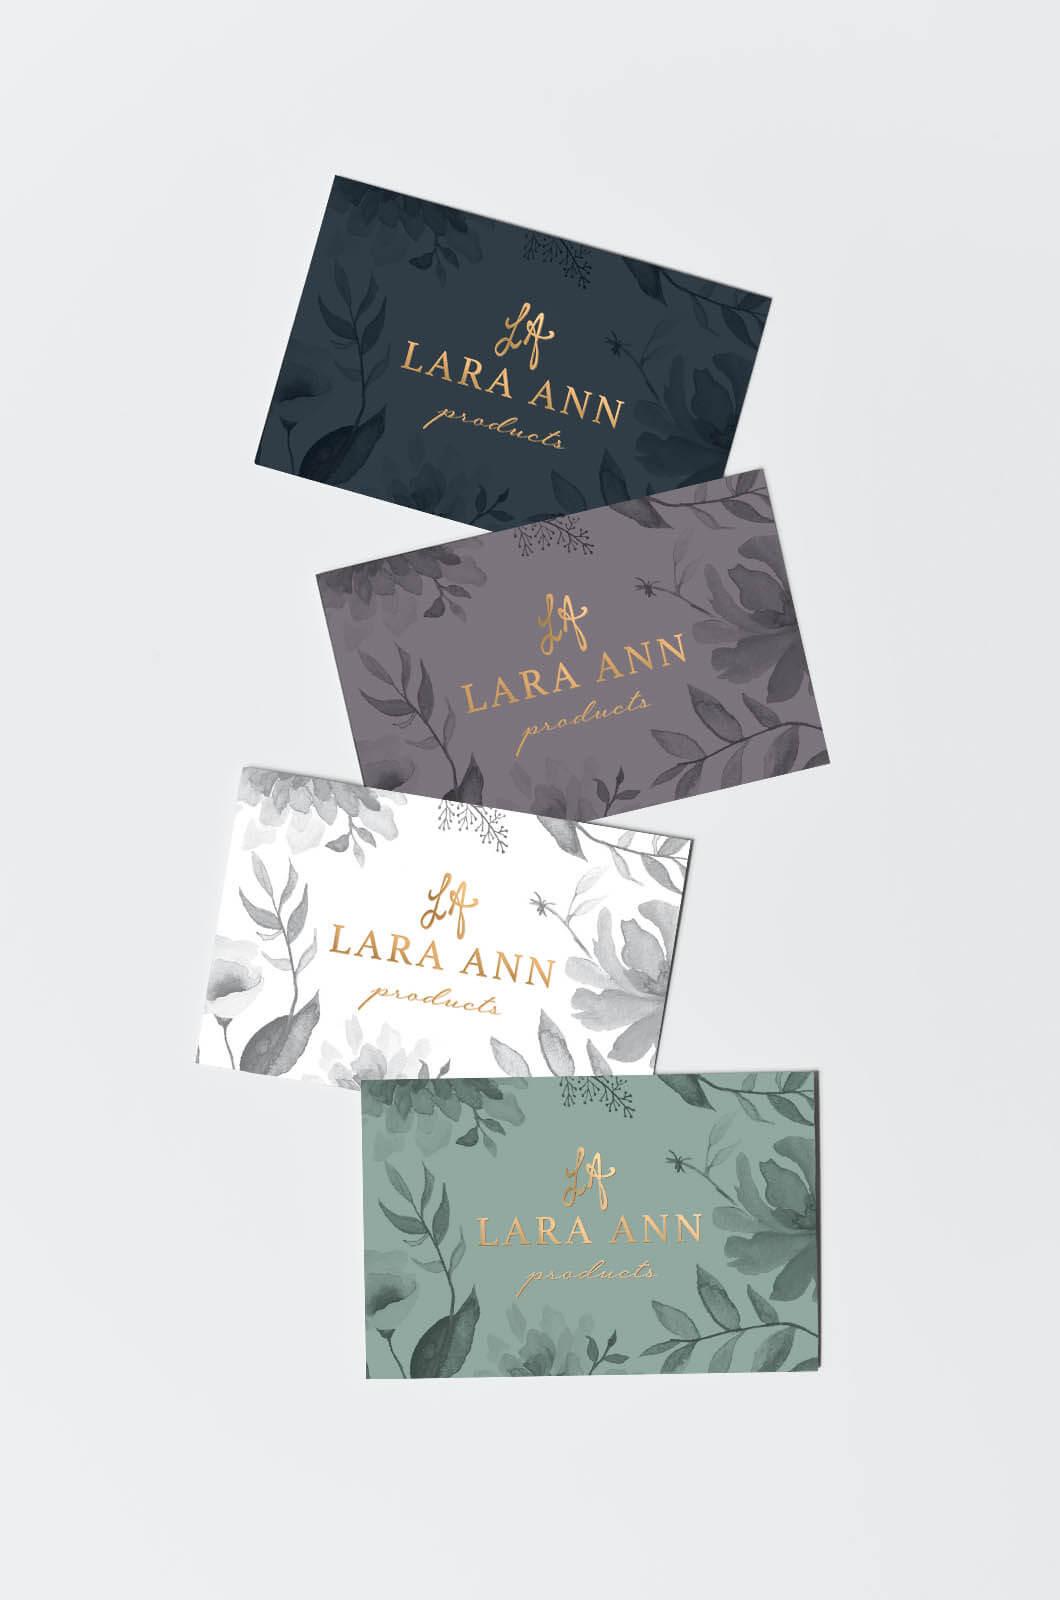 belovedpine_branding_laraann6-2